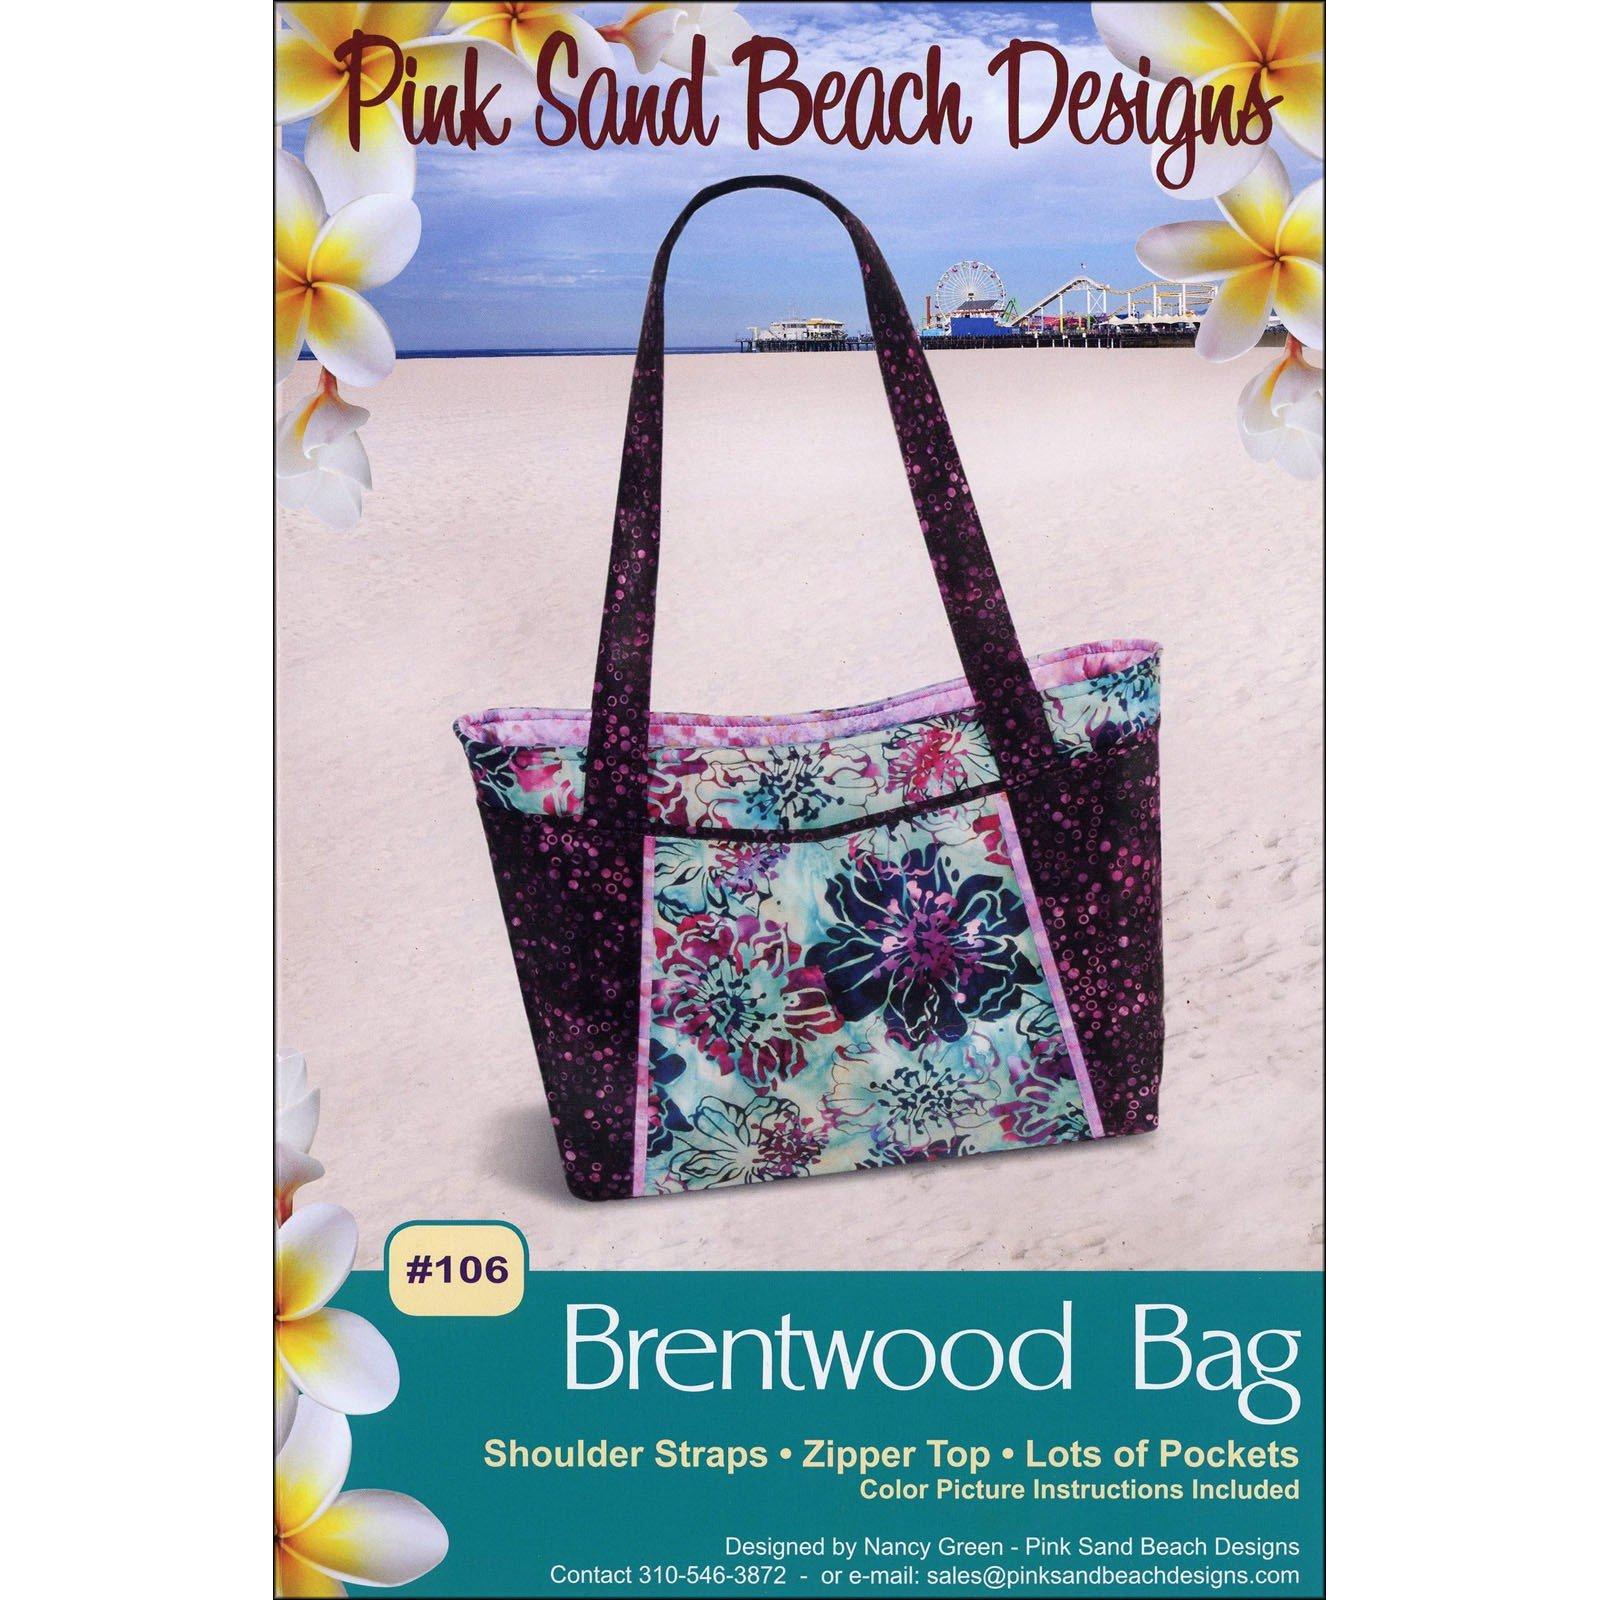 Brentwood Bag!